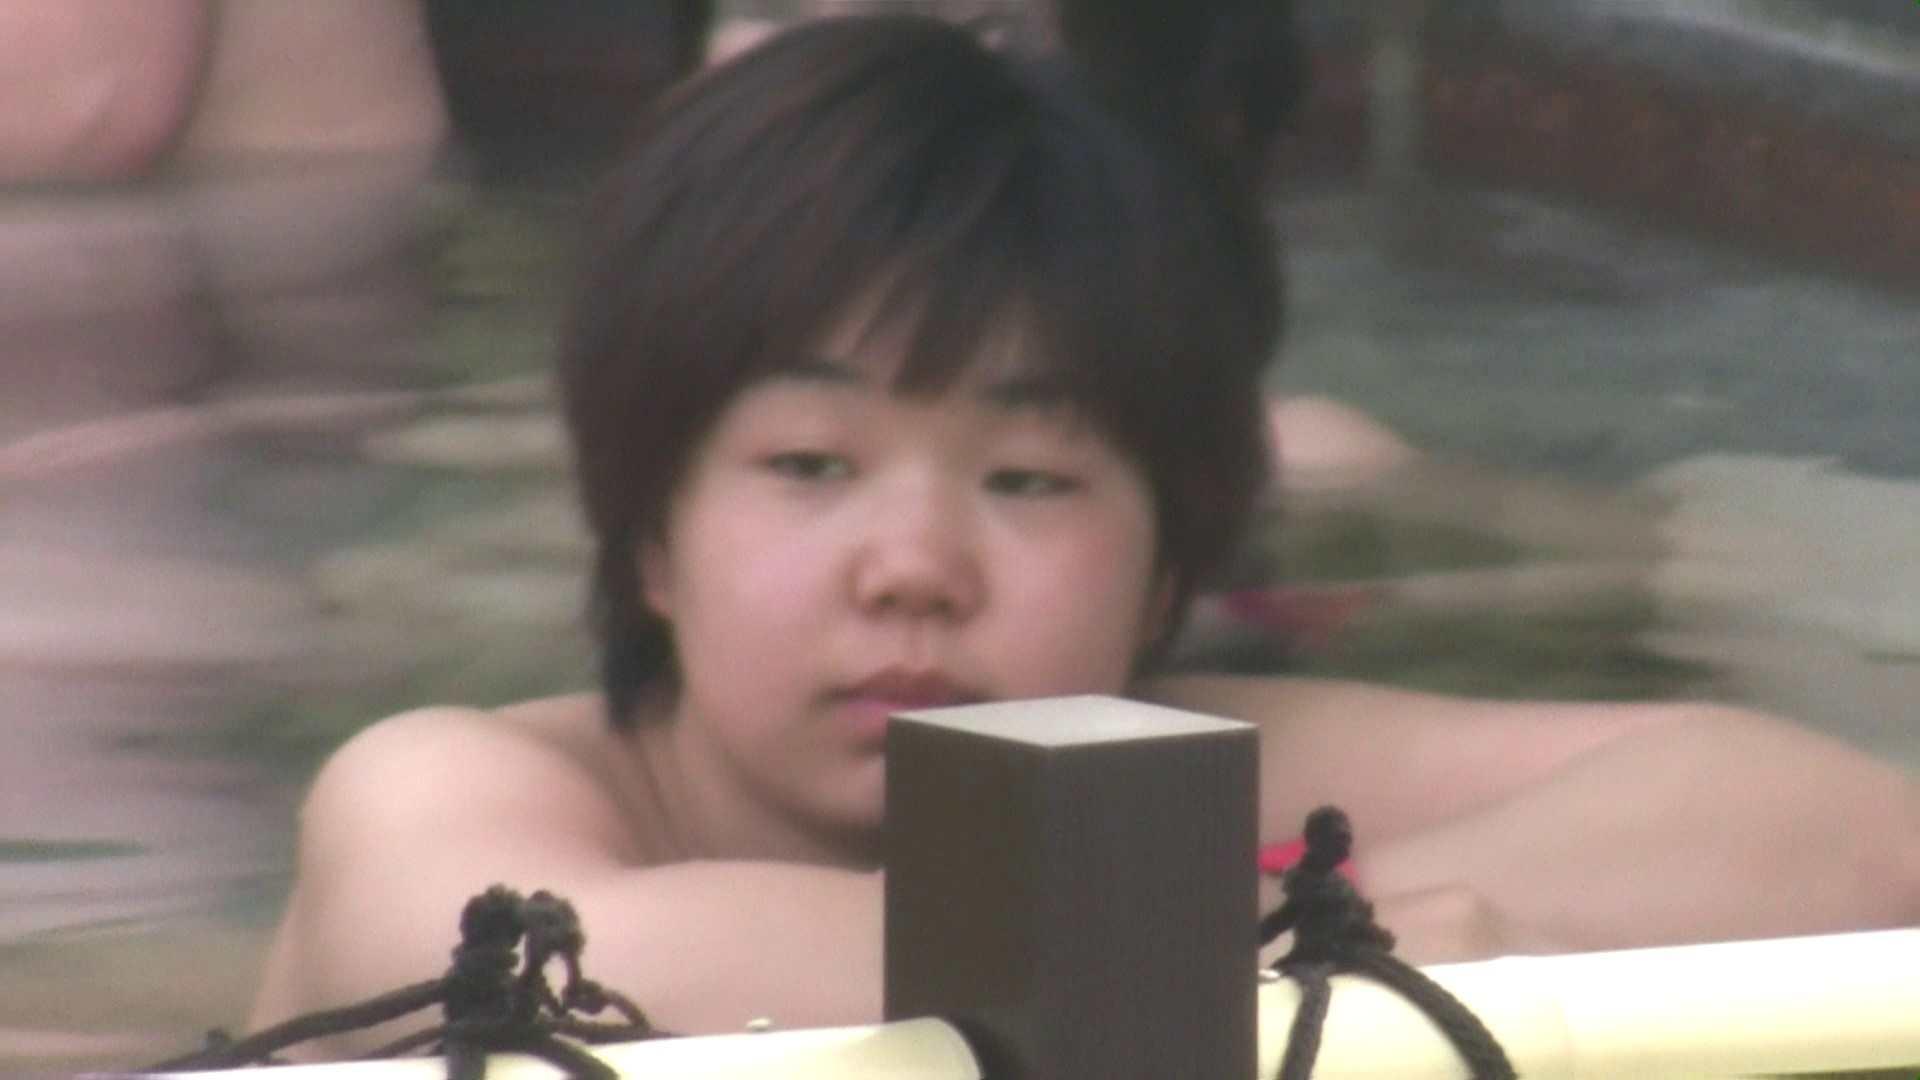 Aquaな露天風呂Vol.53【VIP限定】 盗撮師作品 おまんこ動画流出 78pic 35